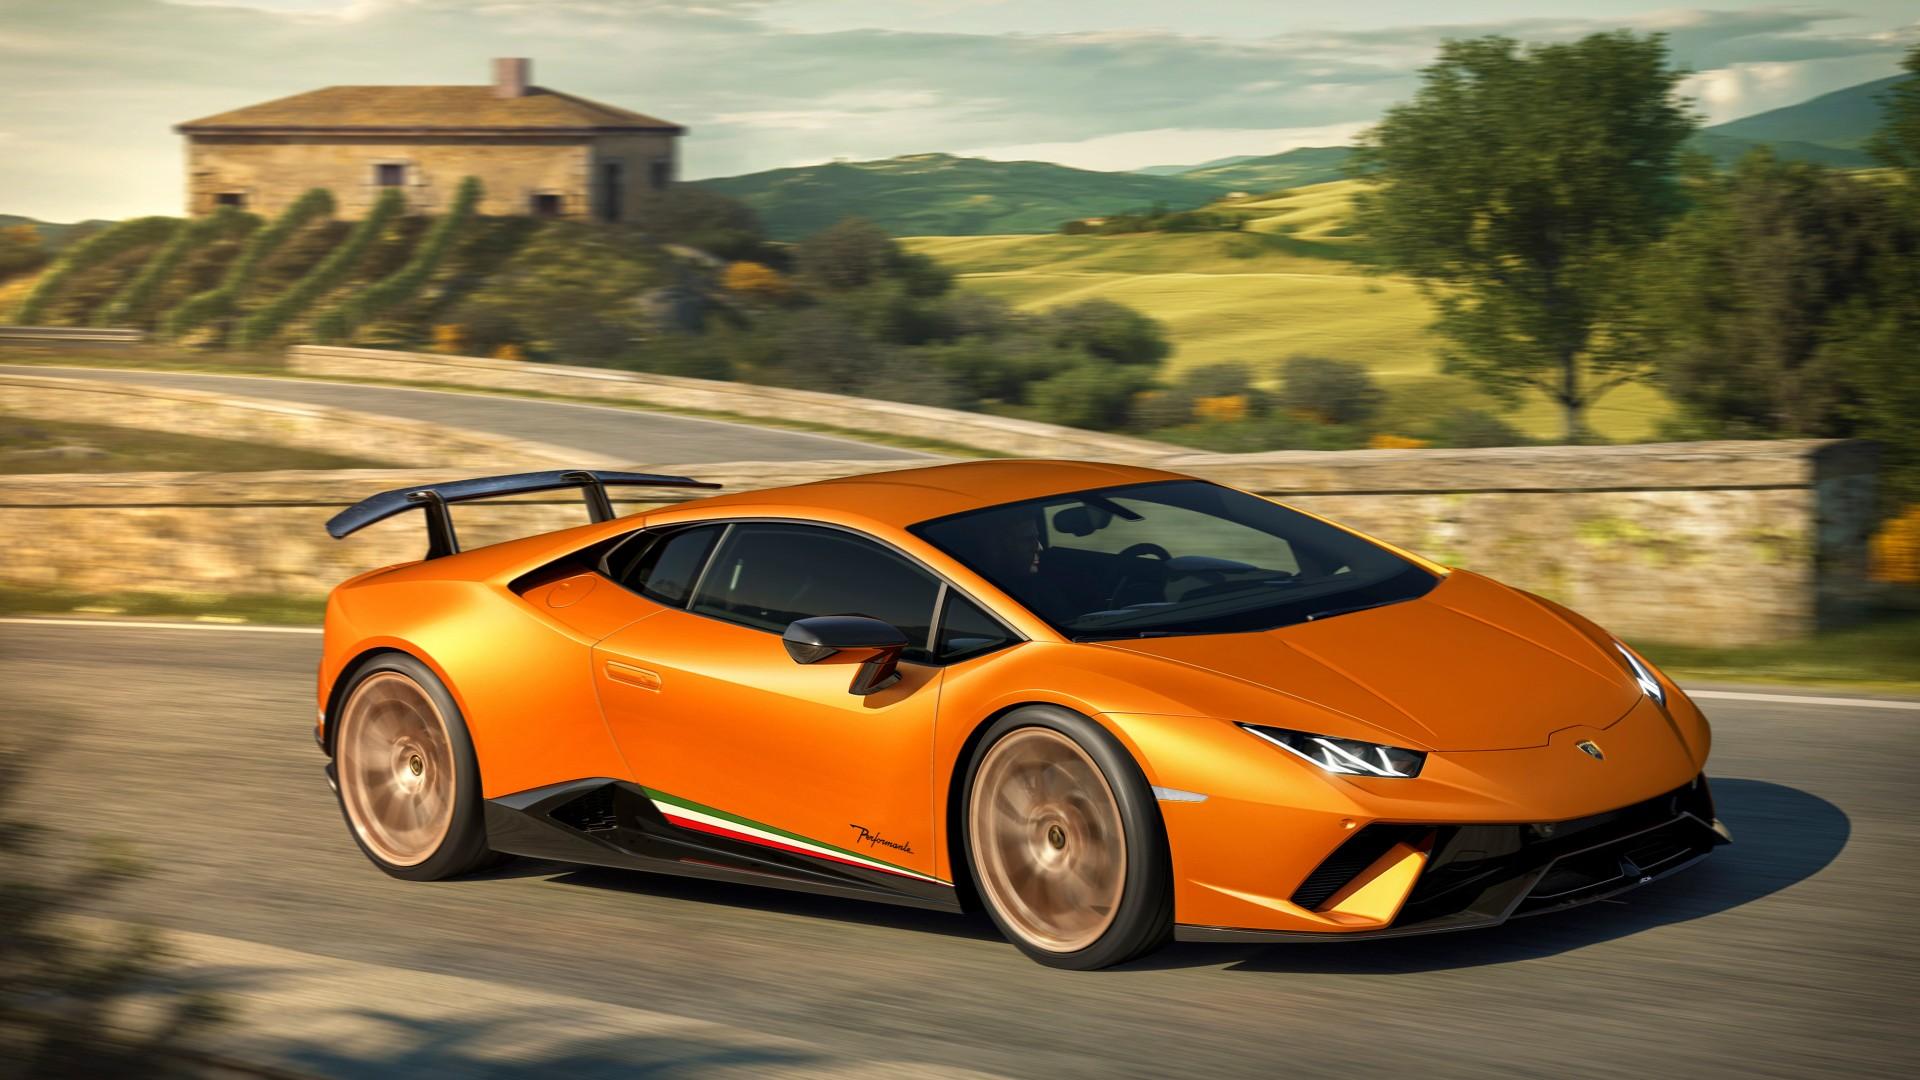 2017 Lamborghini Huracan Performante 2 Wallpaper | HD Car ...